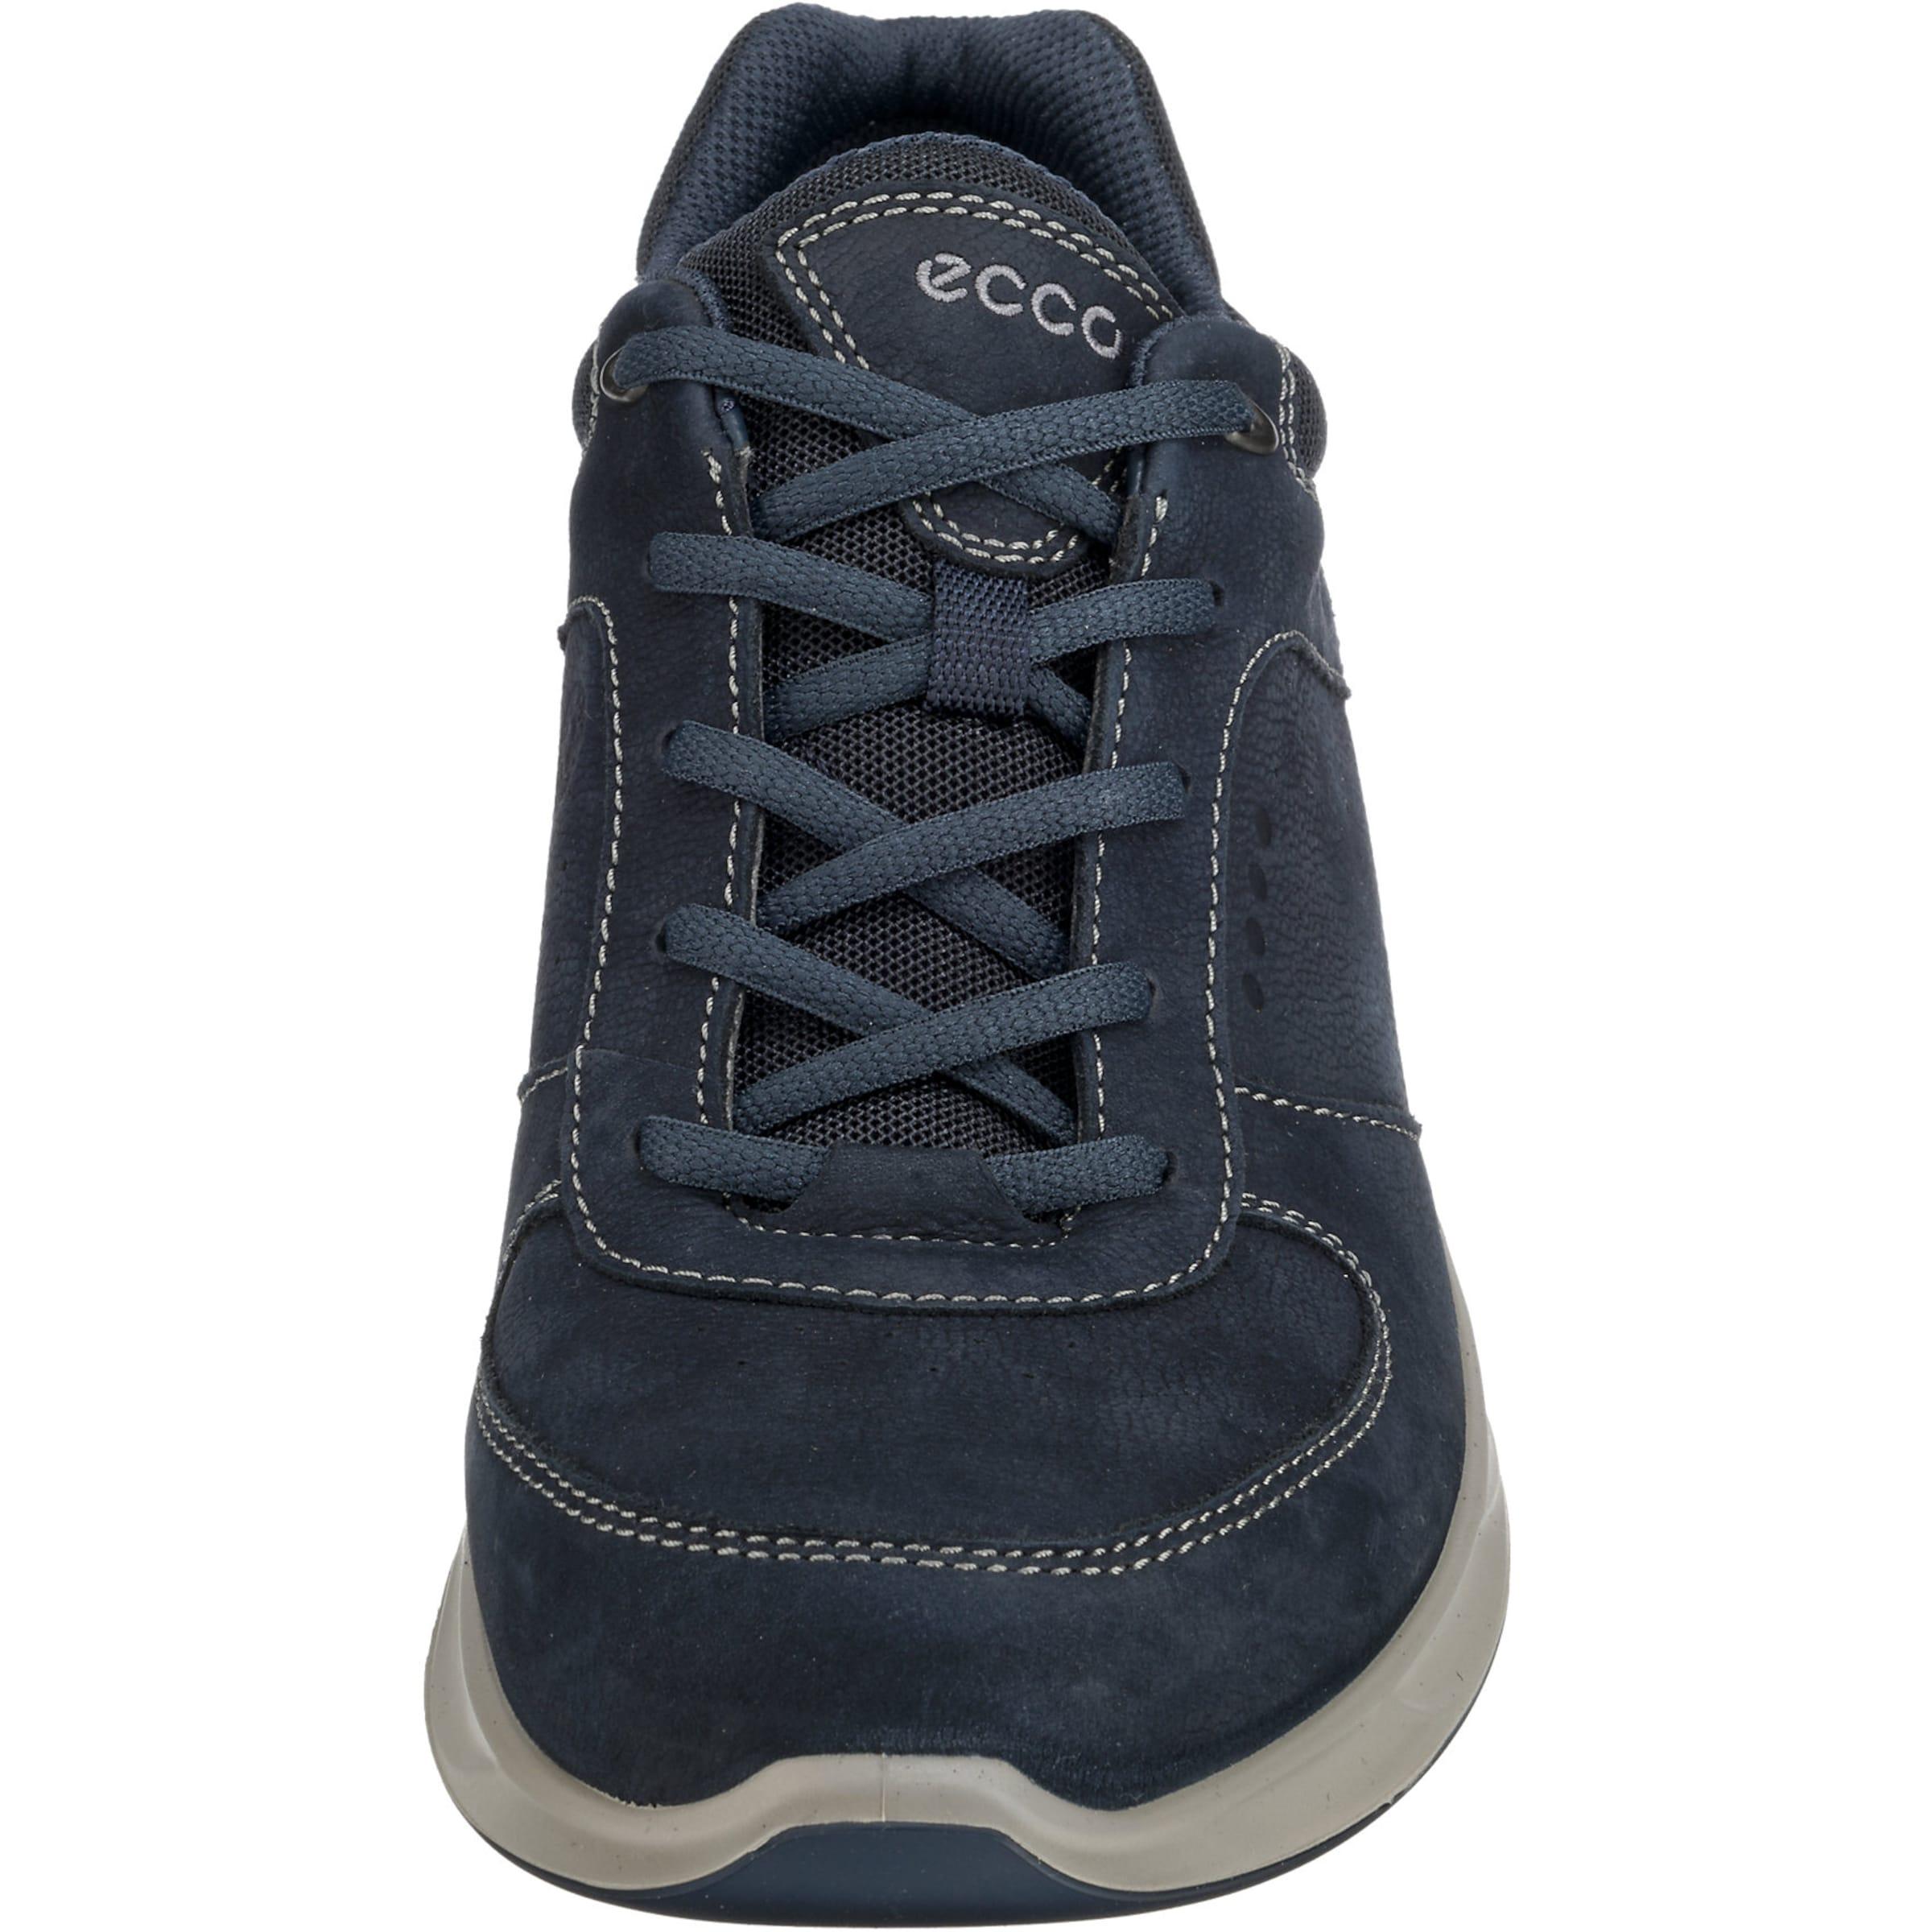 ECCO Schuhe Leder, Leder, Leder, Textil Wilde Freizeitschuhe a2d259